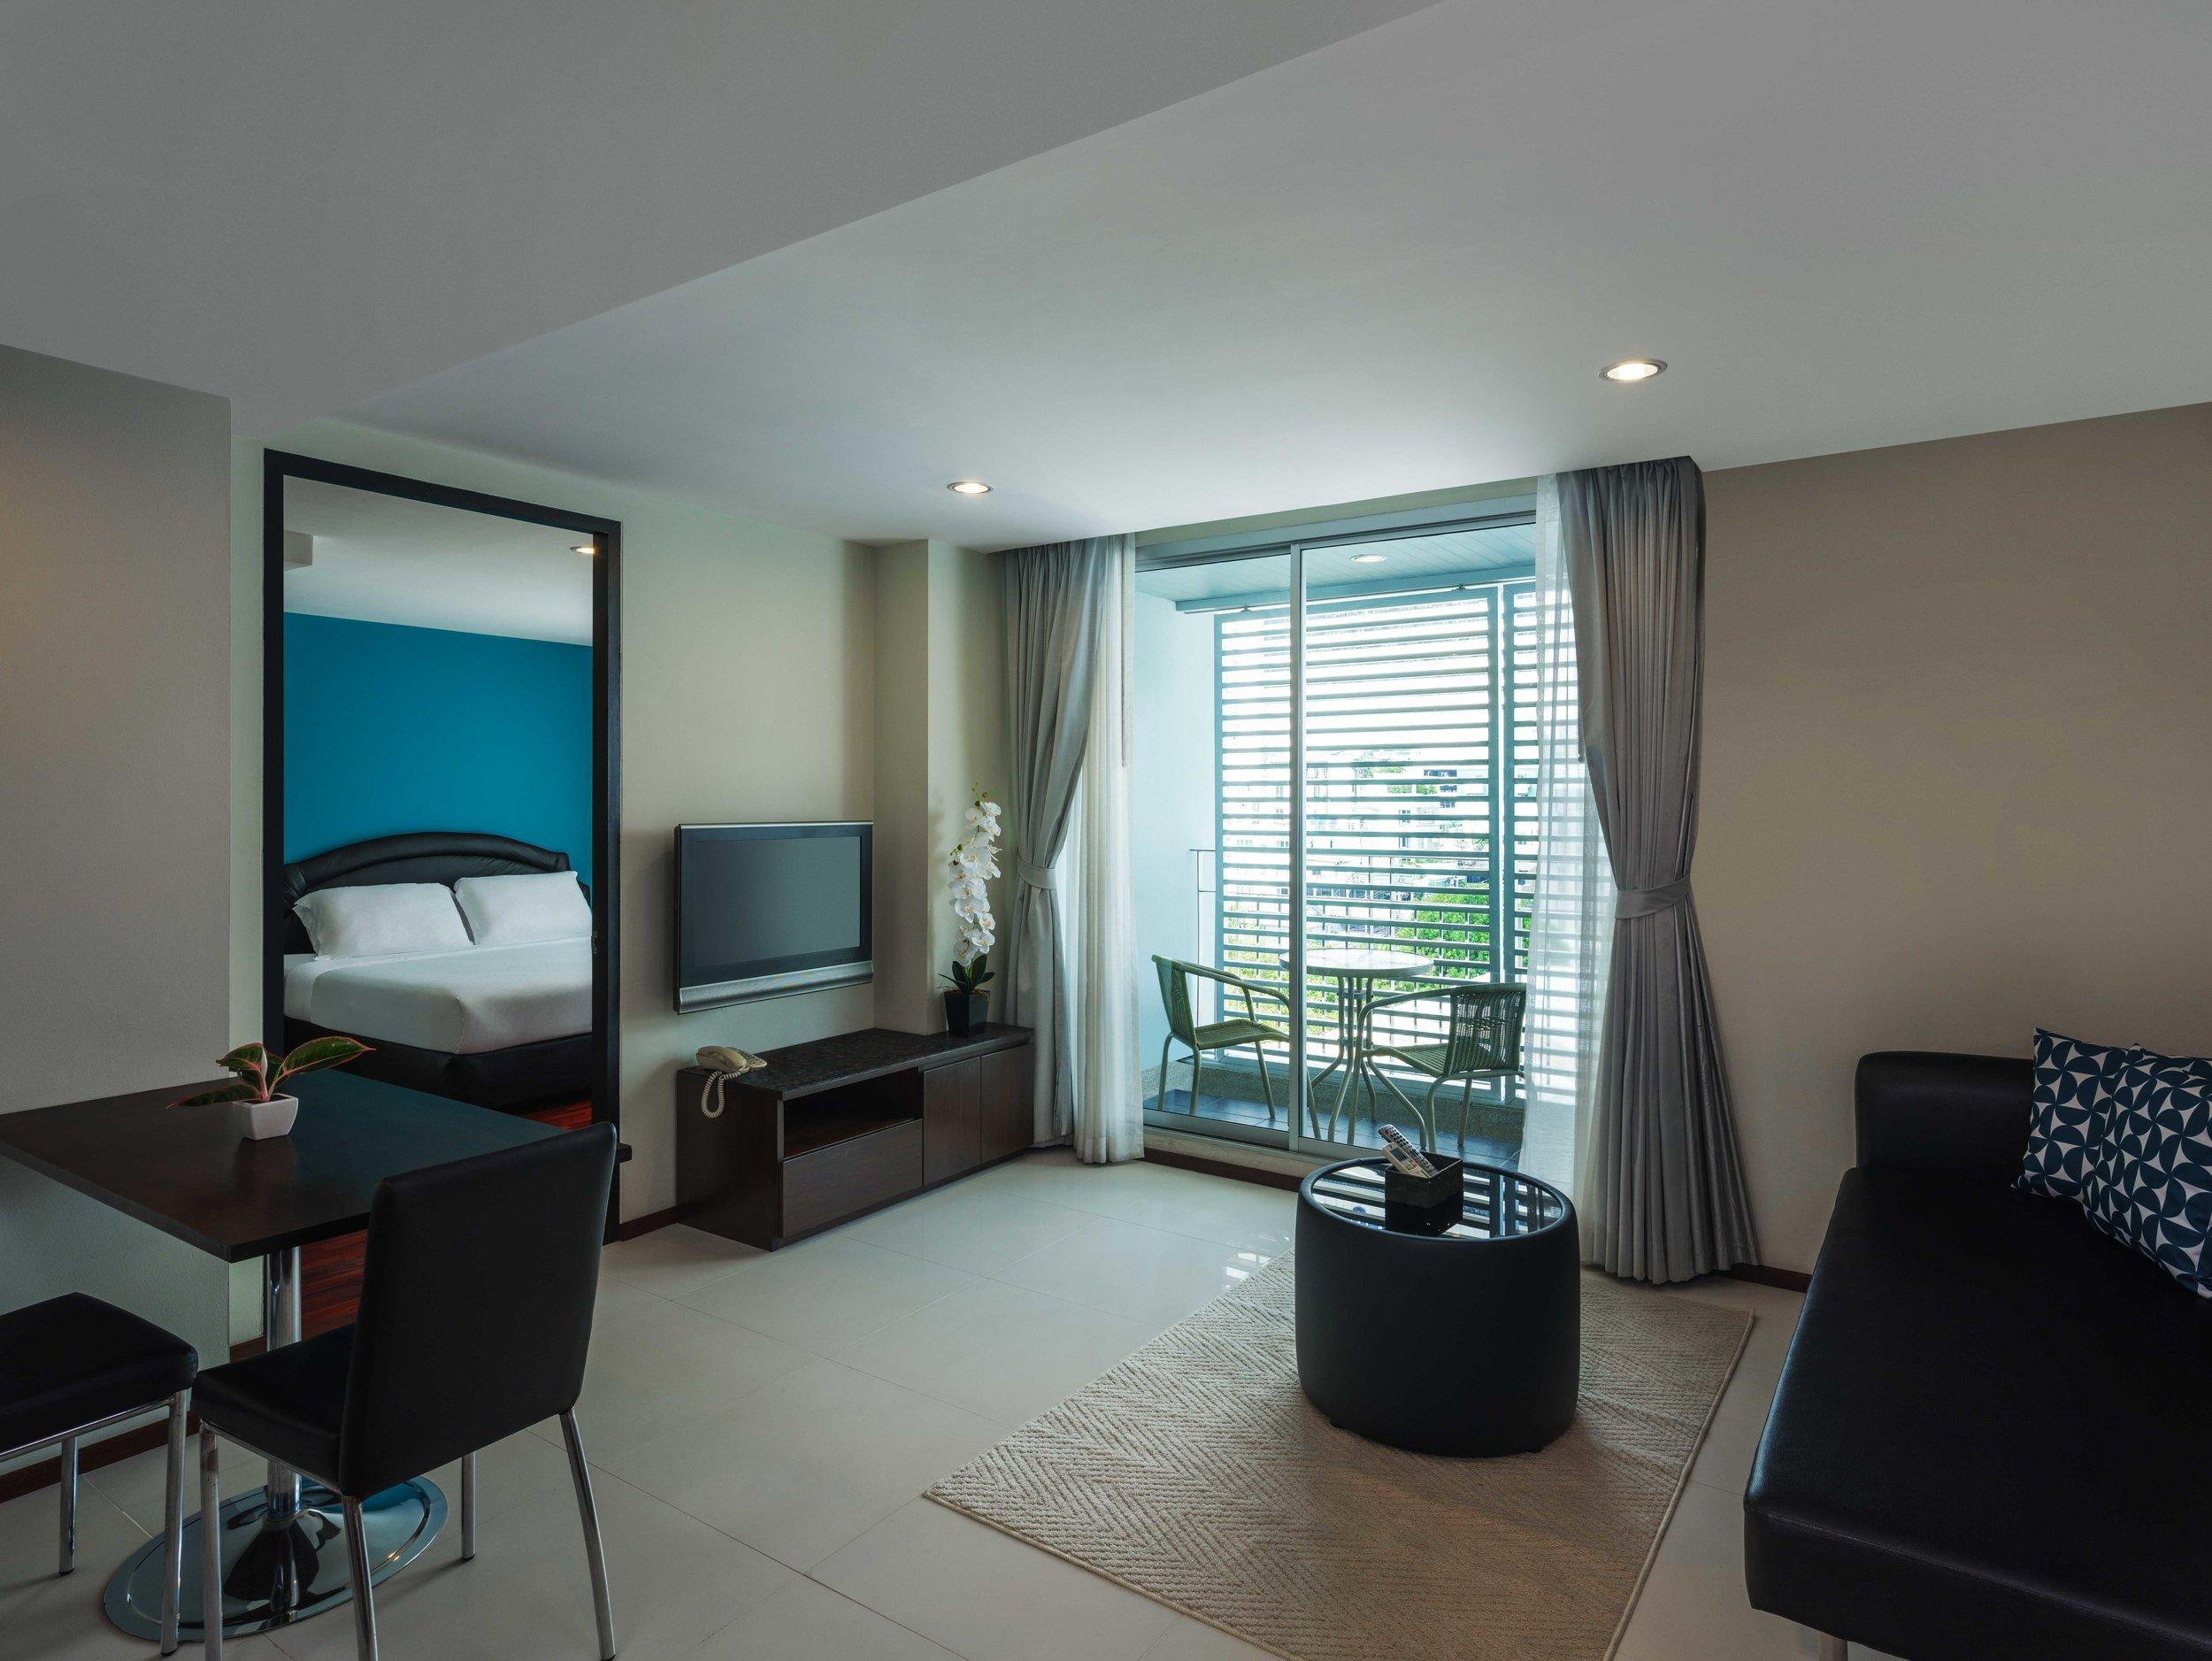 Room-706-008-Edit.jpg